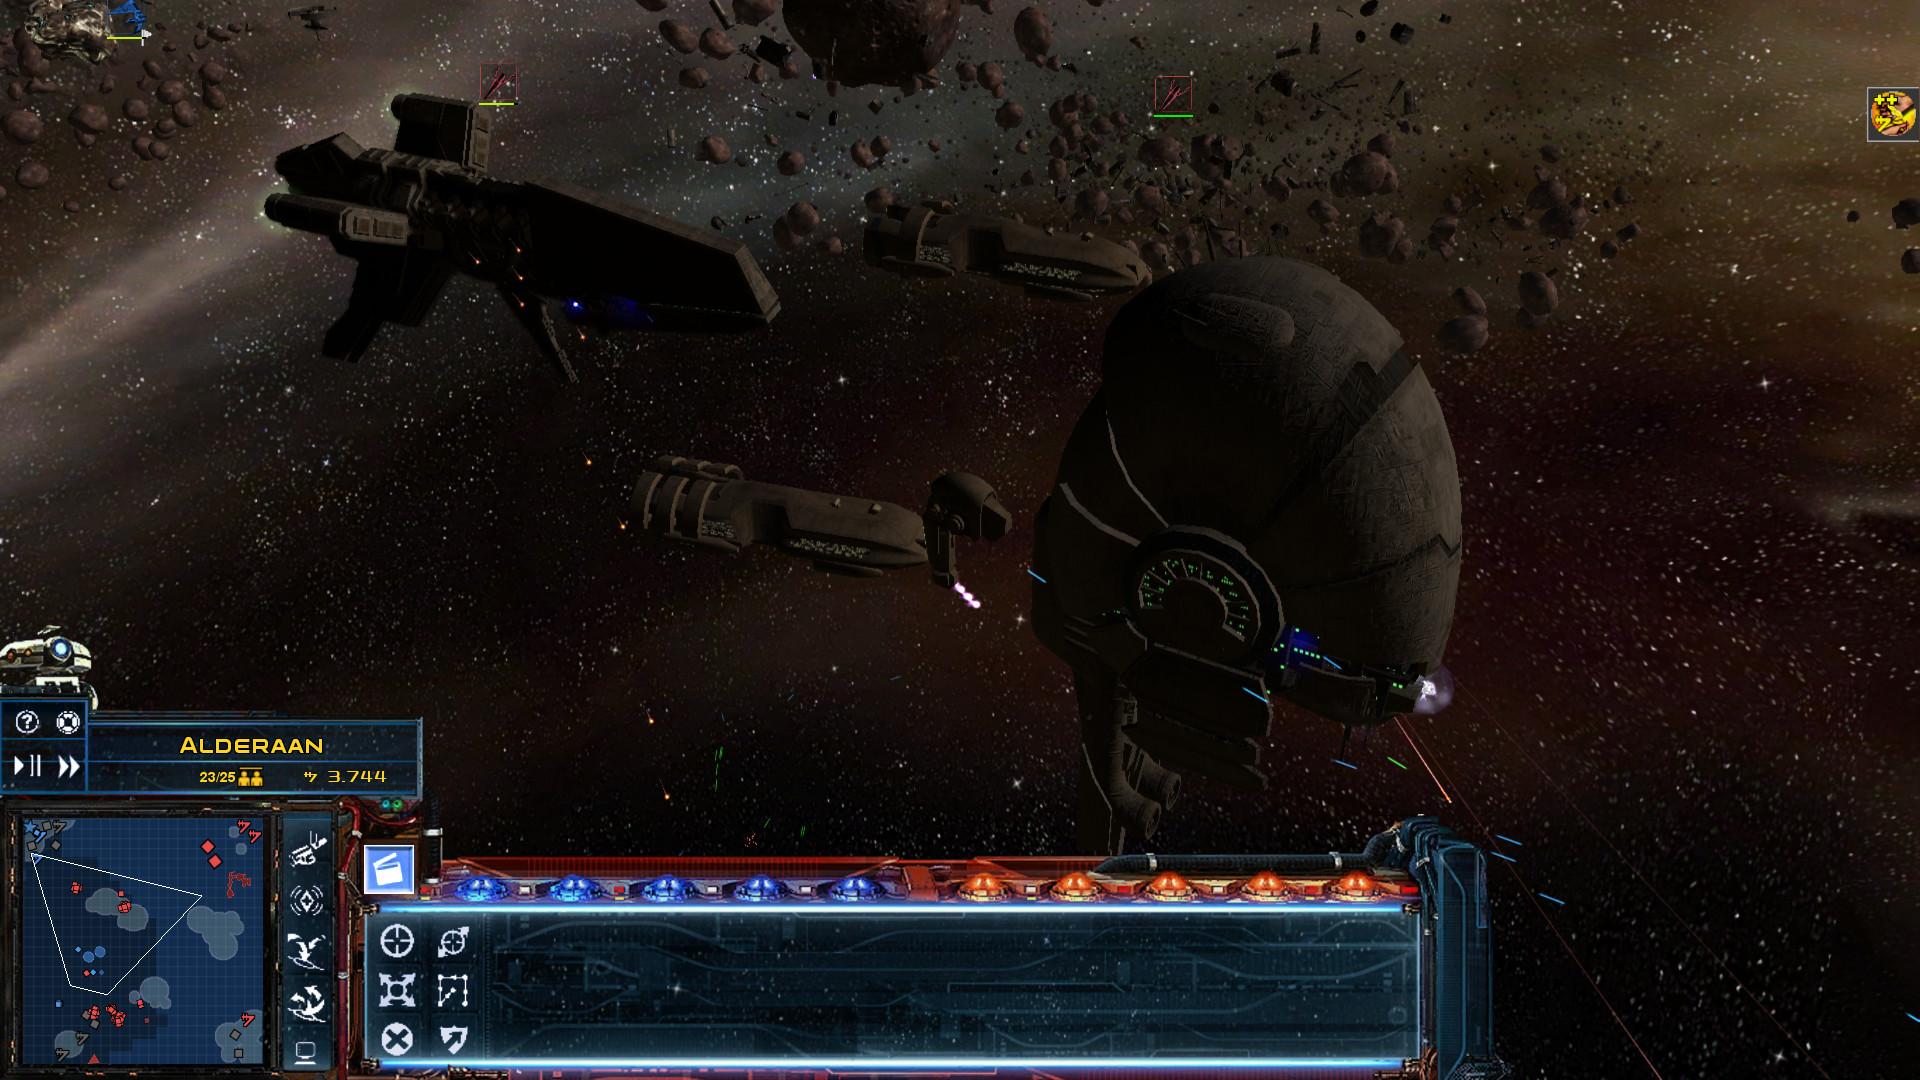 Report RSS Mandalorian fleet (view original)